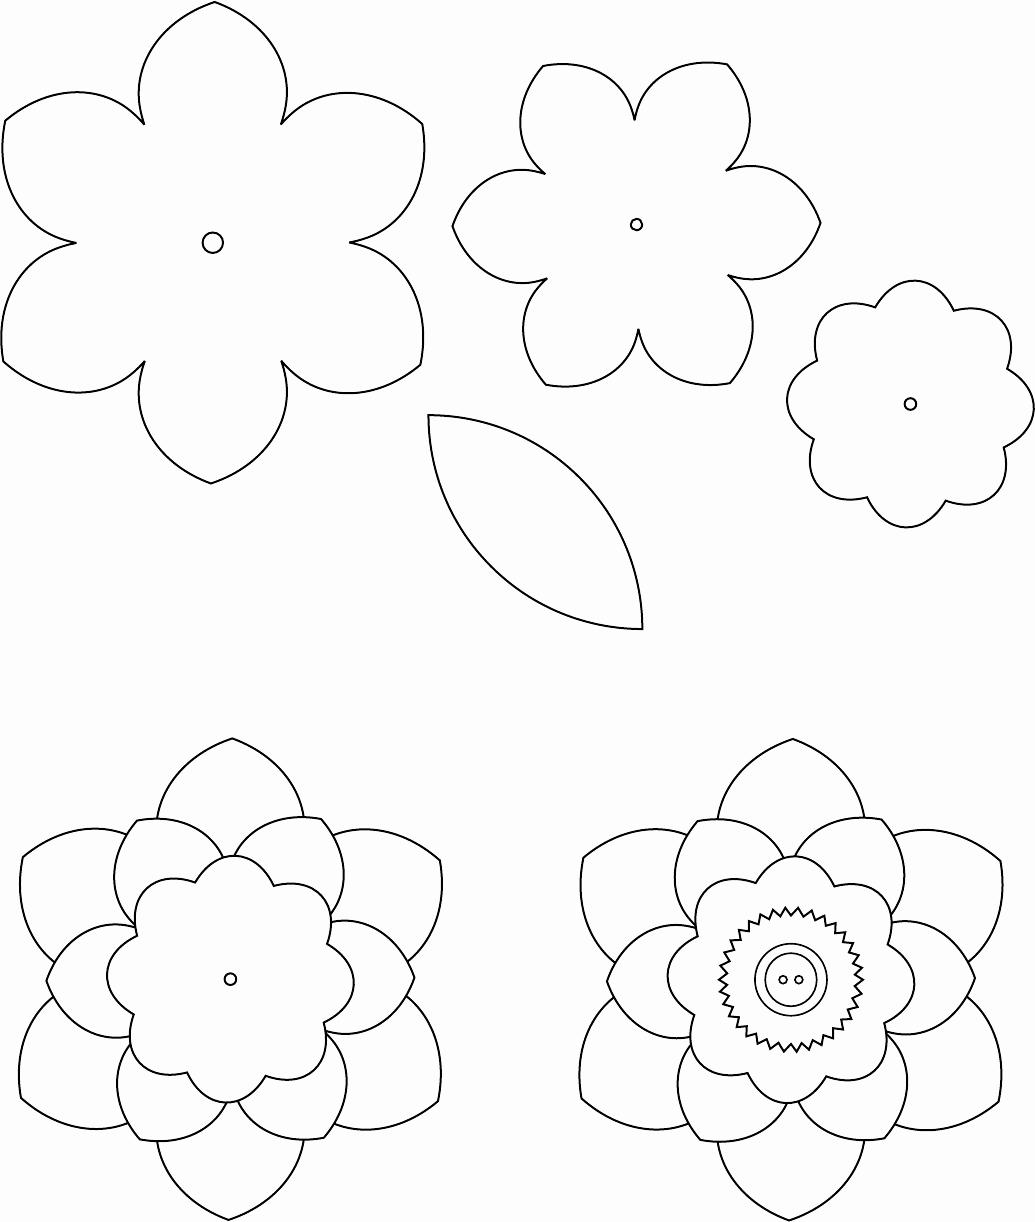 Small Paper Flower Templates Lovely Flower Template 1 трафареты цветы Pinterest